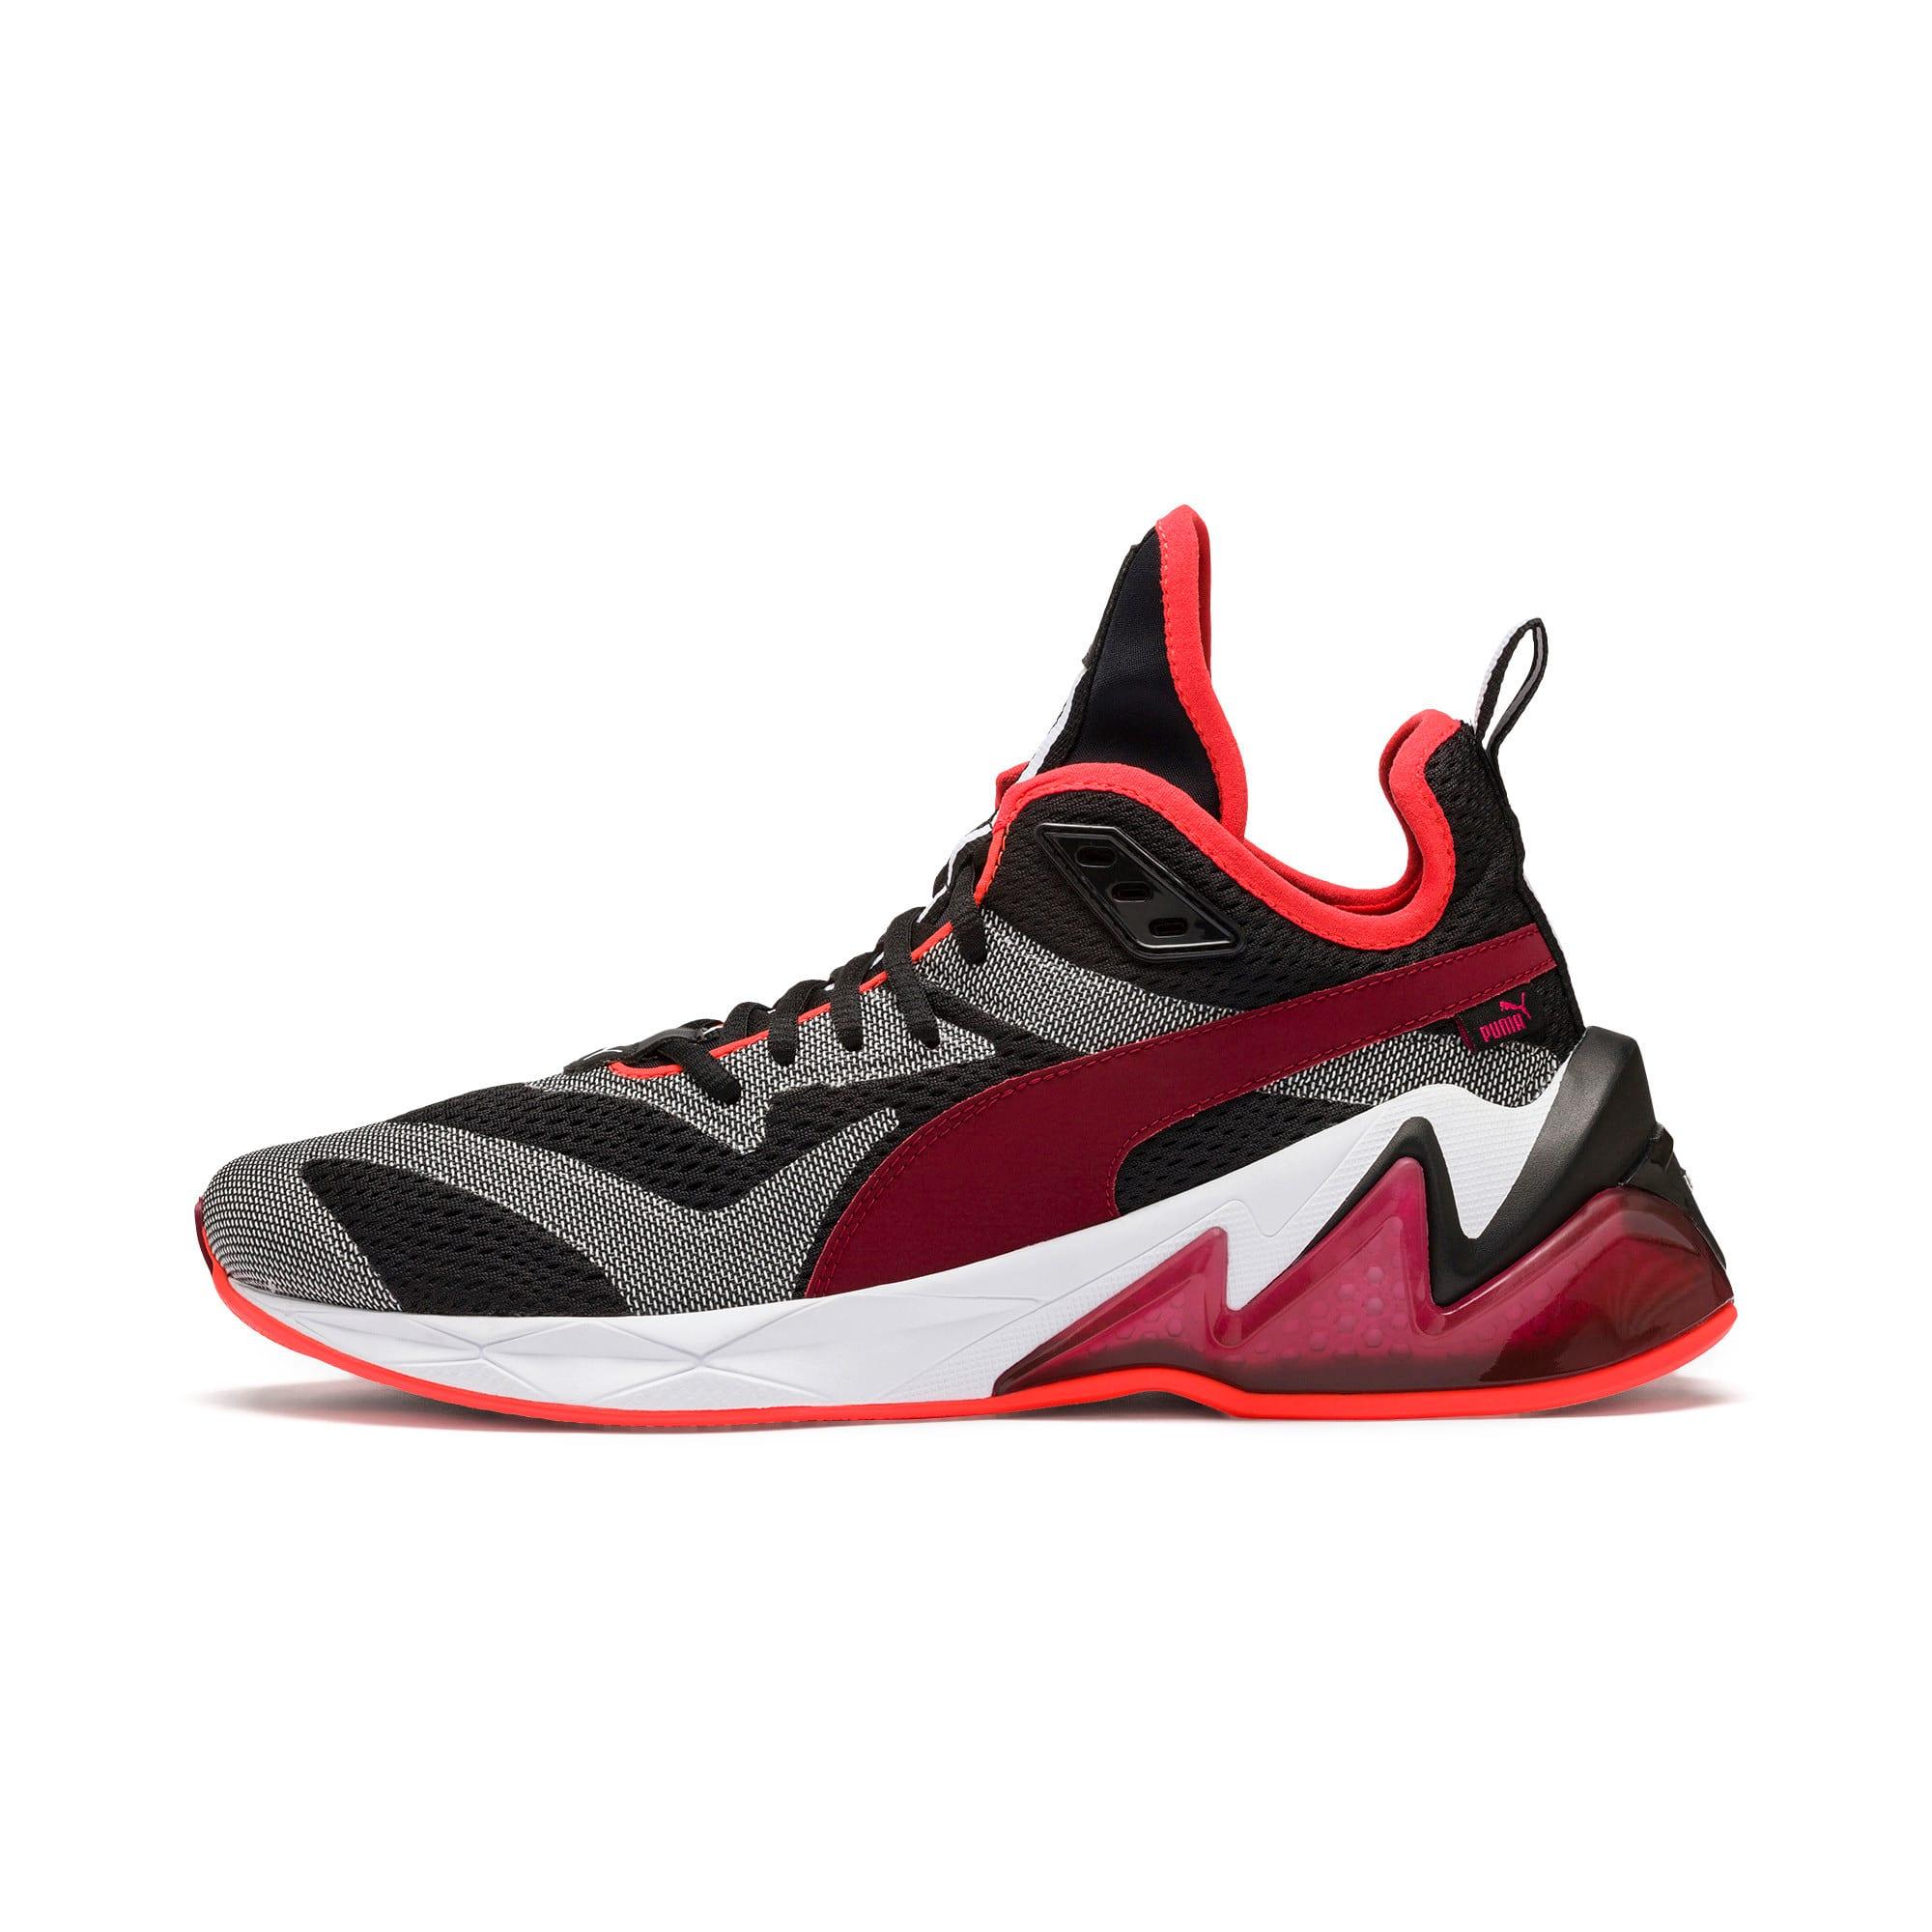 Thumbnail 1 of LQDCELL Origin Tech Men's Shoes, Puma Black-Rhubarb, medium